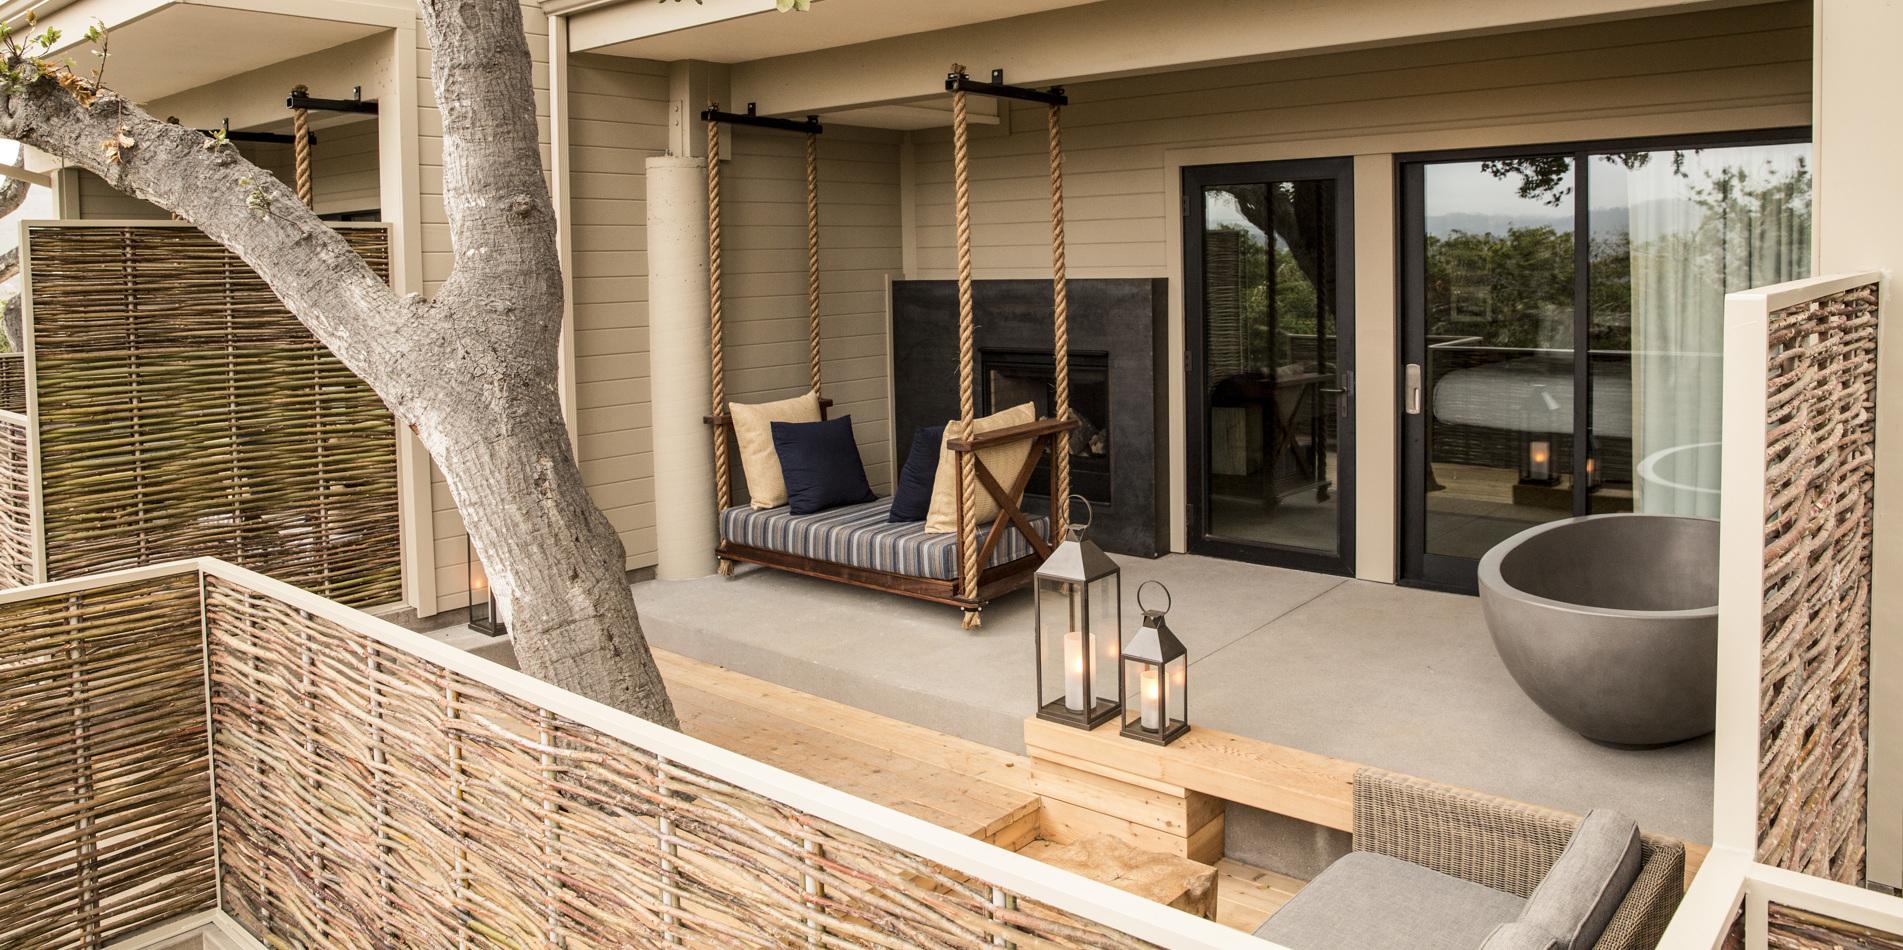 Carmel Valley Ranch_Accommodations_Oak Grove Studio2_decktub